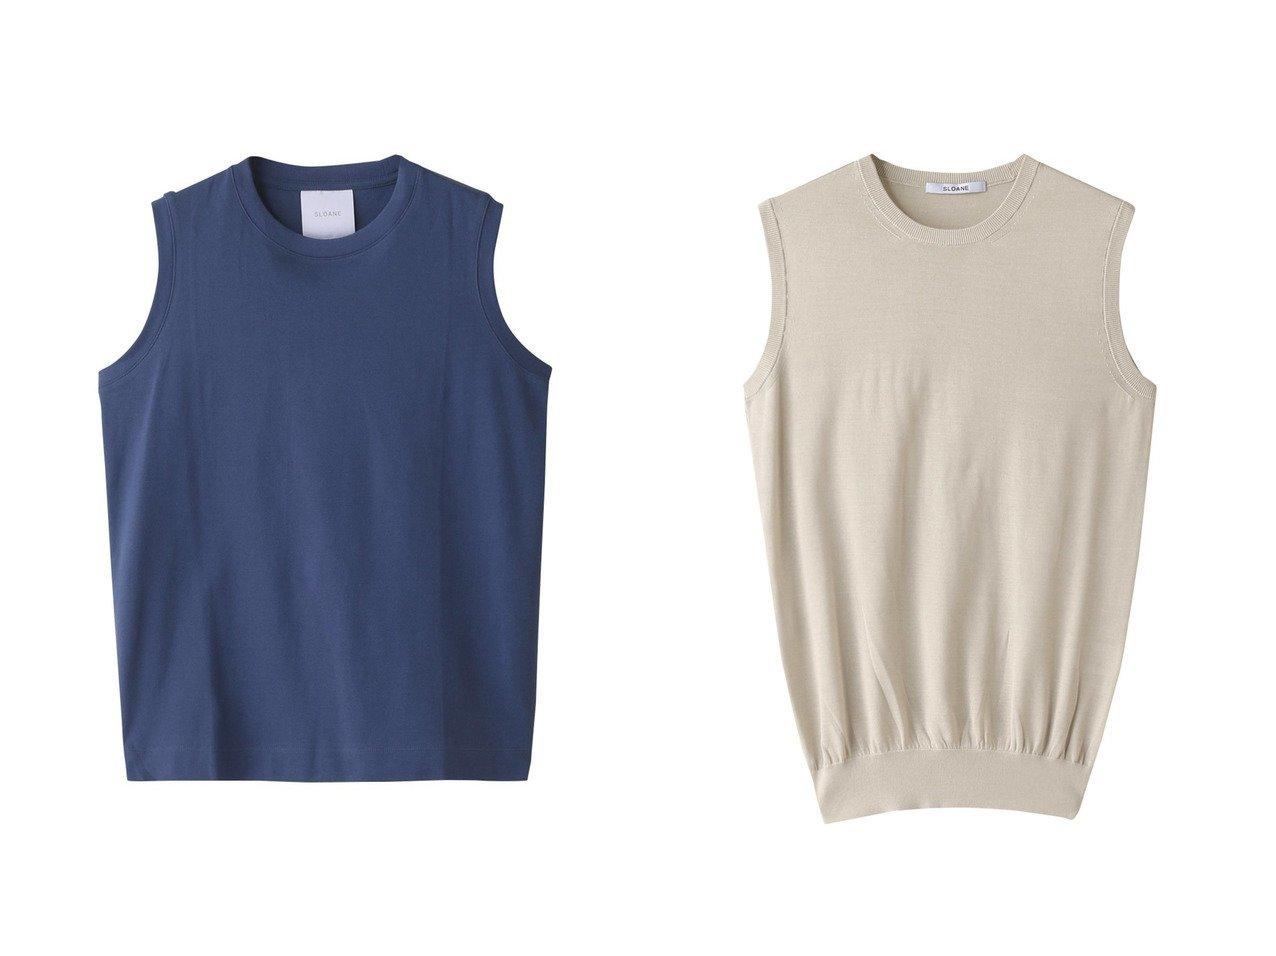 【SLOANE/スローン】の2コットン鹿の子ノースリーブ&18G シルク天竺ノースリーブ 【トップス・カットソー】おすすめ!人気、トレンド・レディースファッションの通販  おすすめで人気の流行・トレンド、ファッションの通販商品 メンズファッション・キッズファッション・インテリア・家具・レディースファッション・服の通販 founy(ファニー) https://founy.com/ ファッション Fashion レディースファッション WOMEN トップス・カットソー Tops/Tshirt キャミソール / ノースリーブ No Sleeves シャツ/ブラウス Shirts/Blouses ロング / Tシャツ T-Shirts カットソー Cut and Sewn ニット Knit Tops プルオーバー Pullover 2021年 2021 2021春夏・S/S SS/Spring/Summer/2021 S/S・春夏 SS・Spring/Summer キャミソール コンパクト サマー シンプル タンク トレンド ノースリーブ ボトム 春 Spring 鹿の子 シルク スリム フィット ベーシック |ID:crp329100000028284